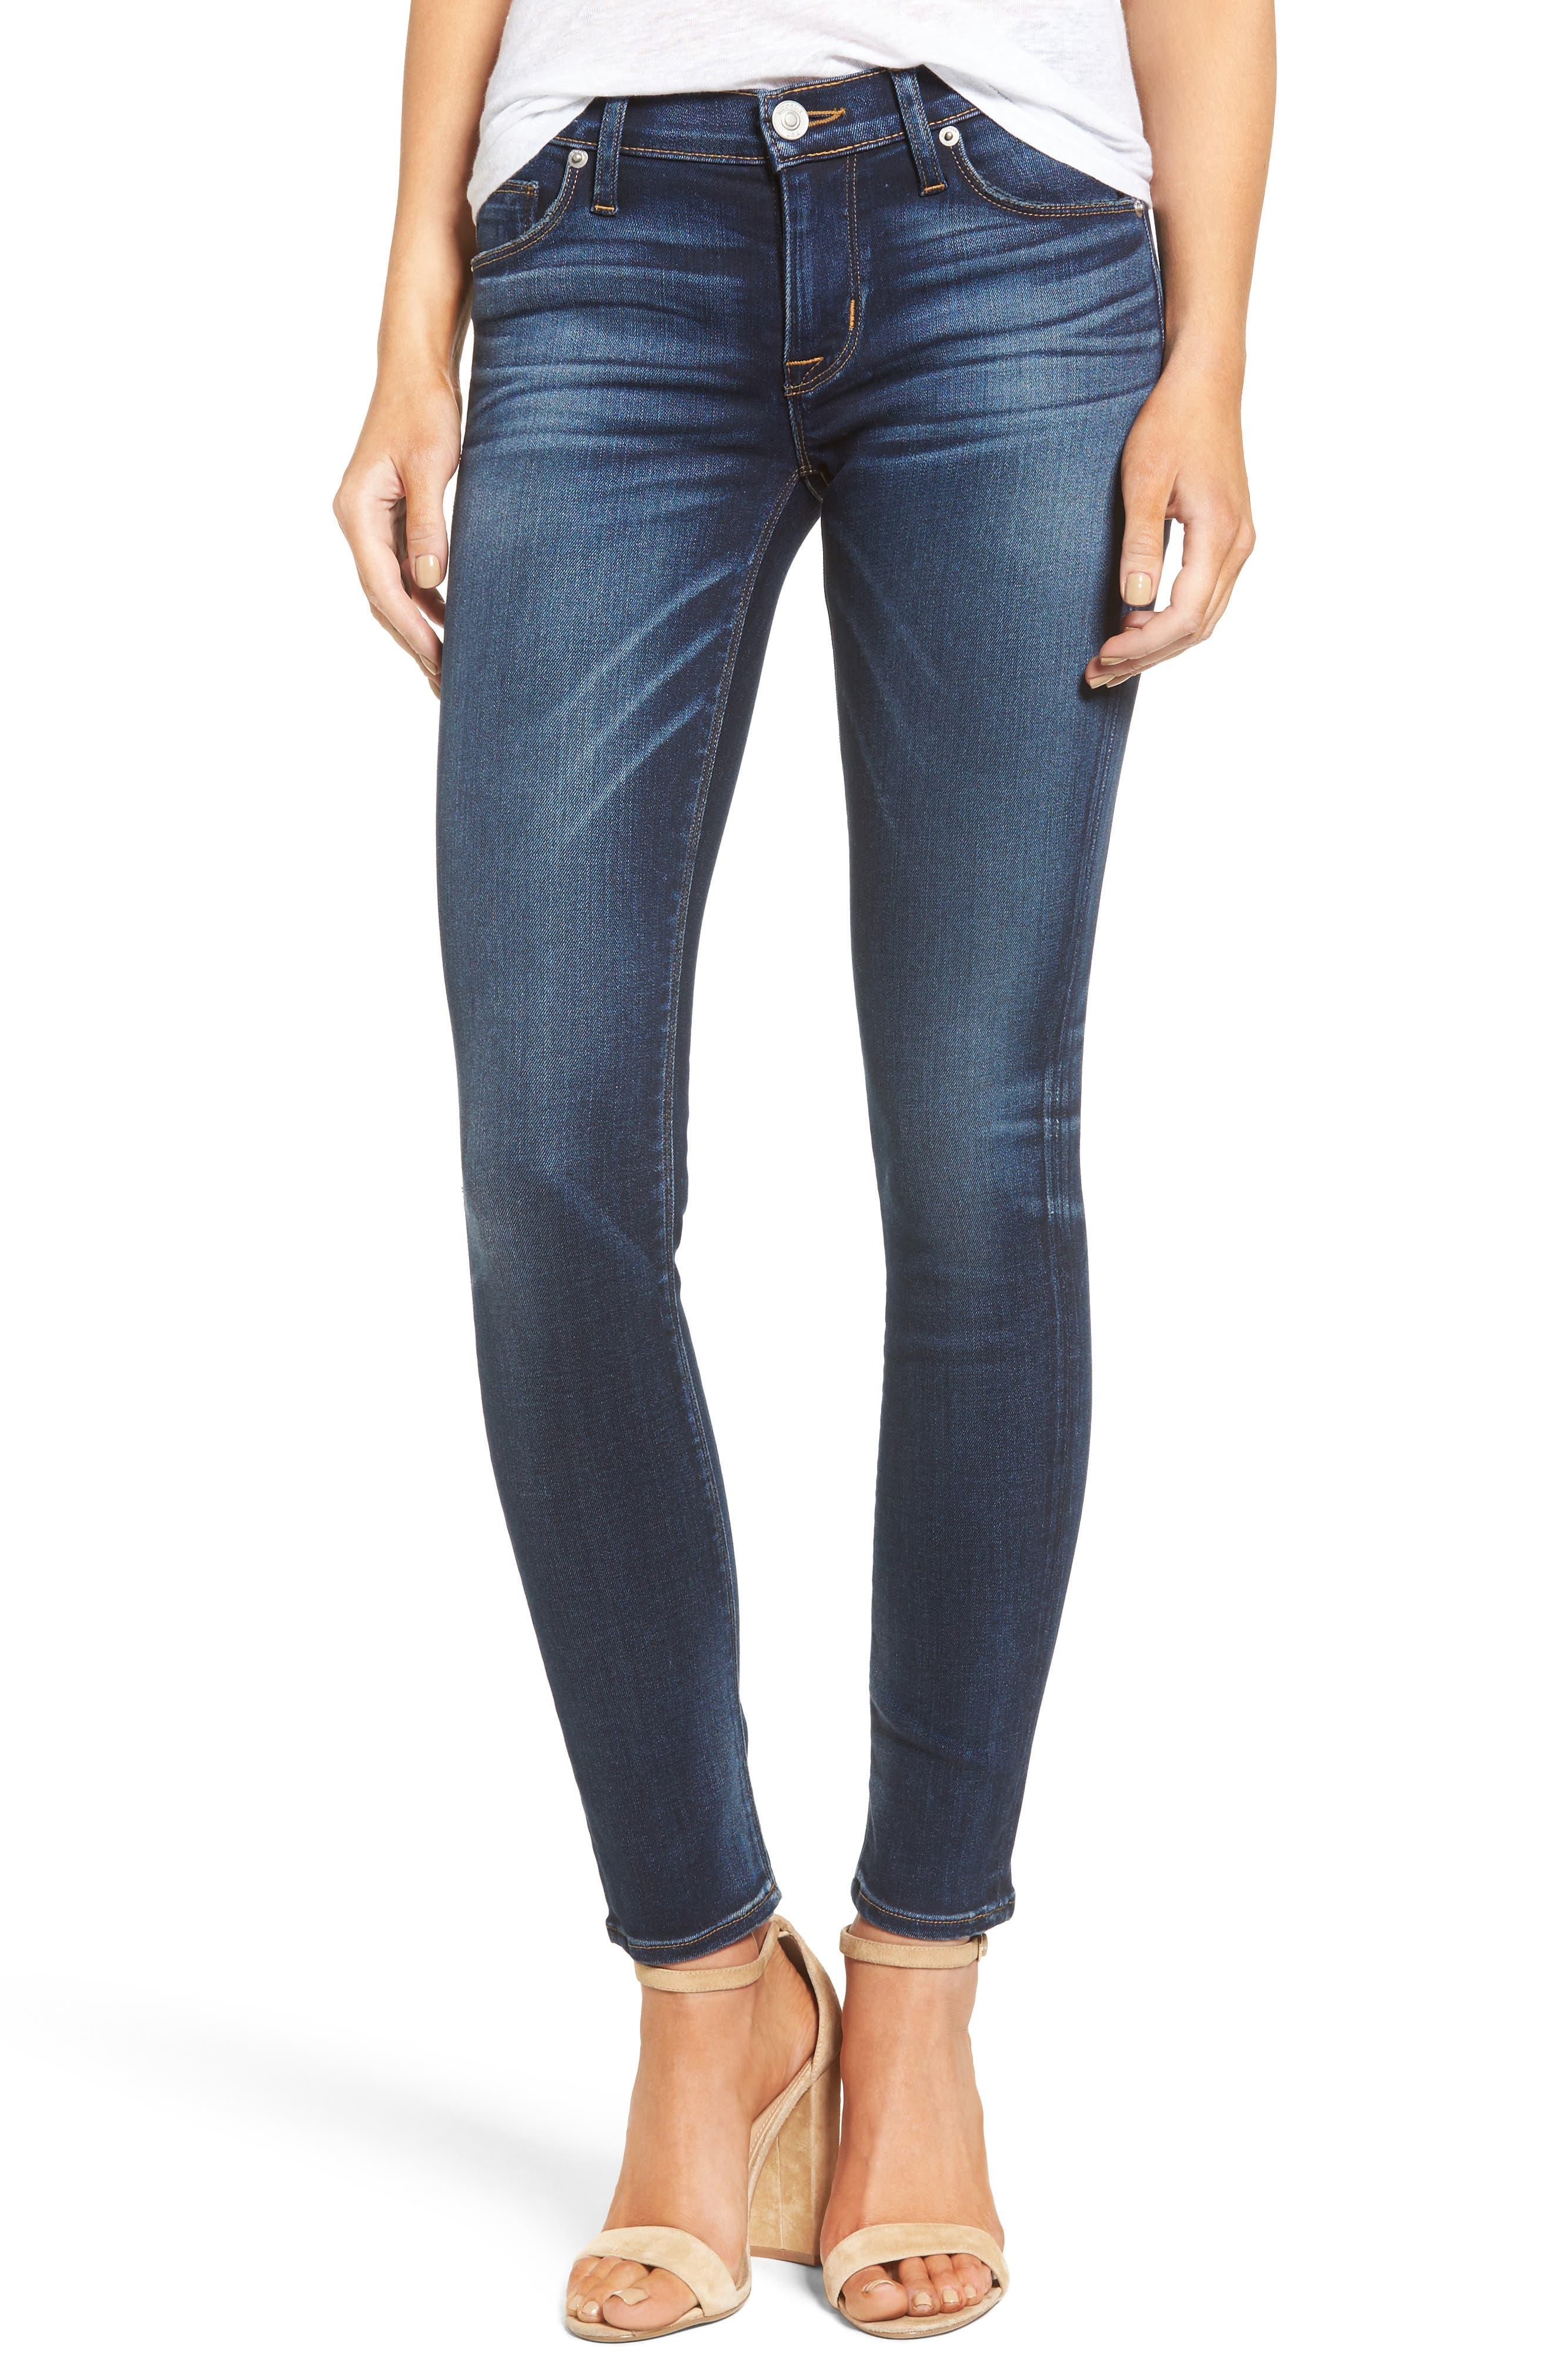 Main Image - Hudson Jeans Nico Supermodel Skinny Jeans (Blue Gold)